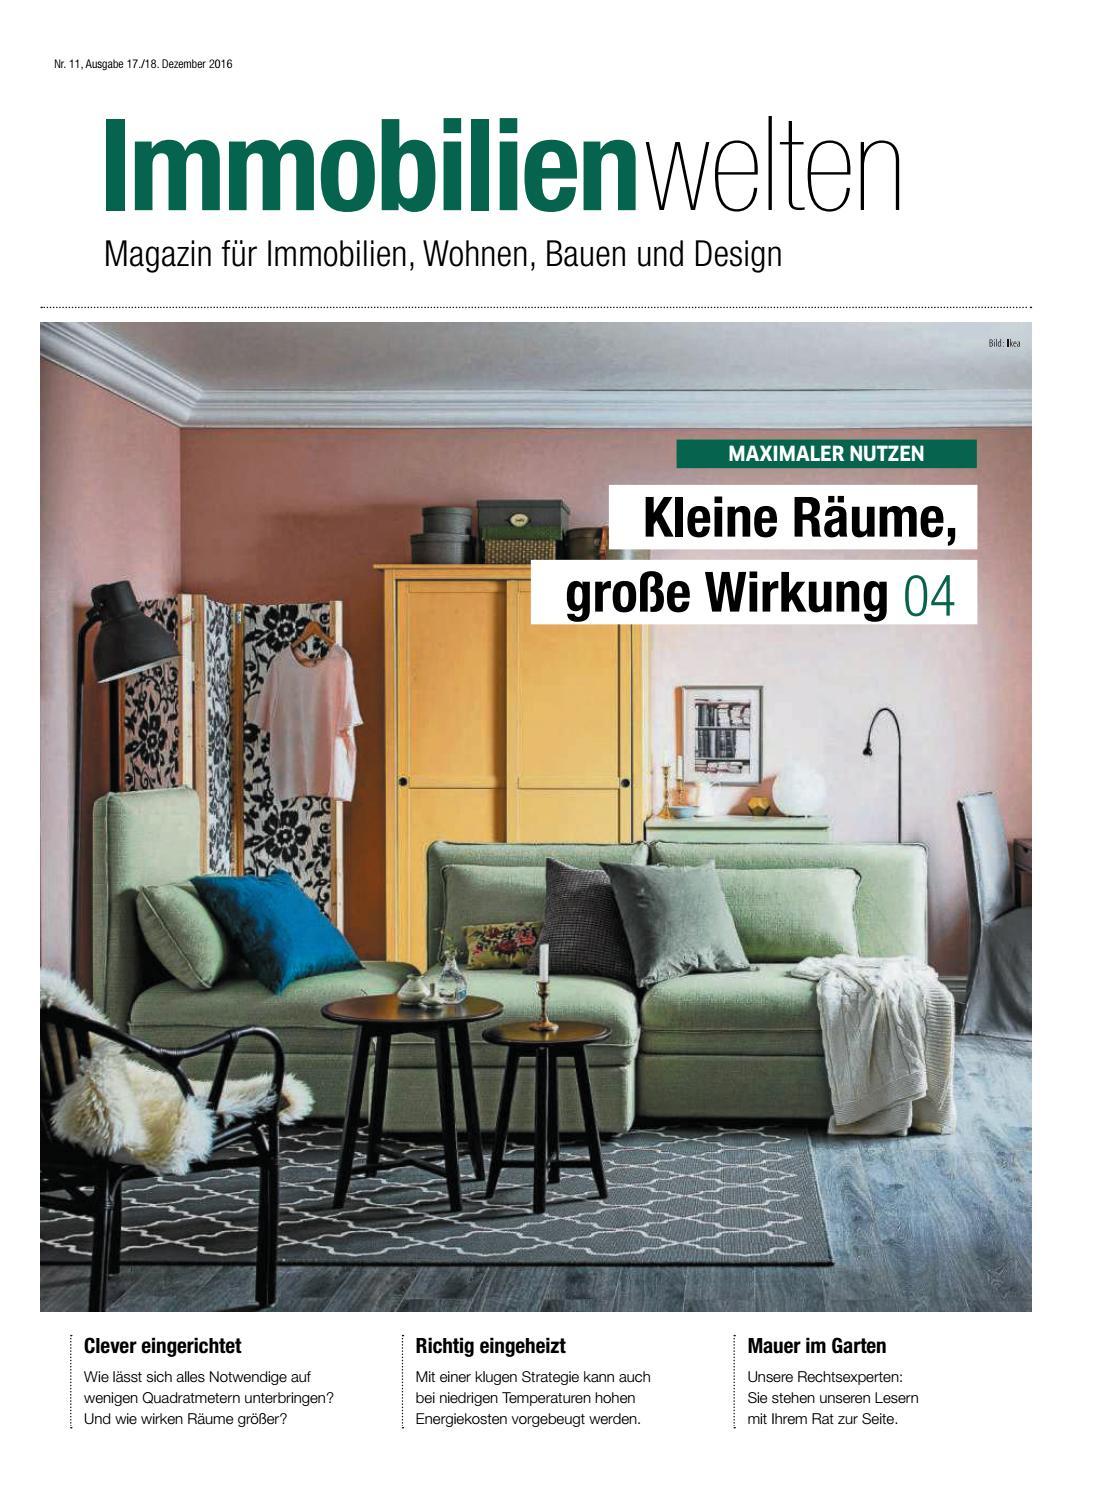 immobilienwelten kleine r ume gro e wirkung by berlin. Black Bedroom Furniture Sets. Home Design Ideas